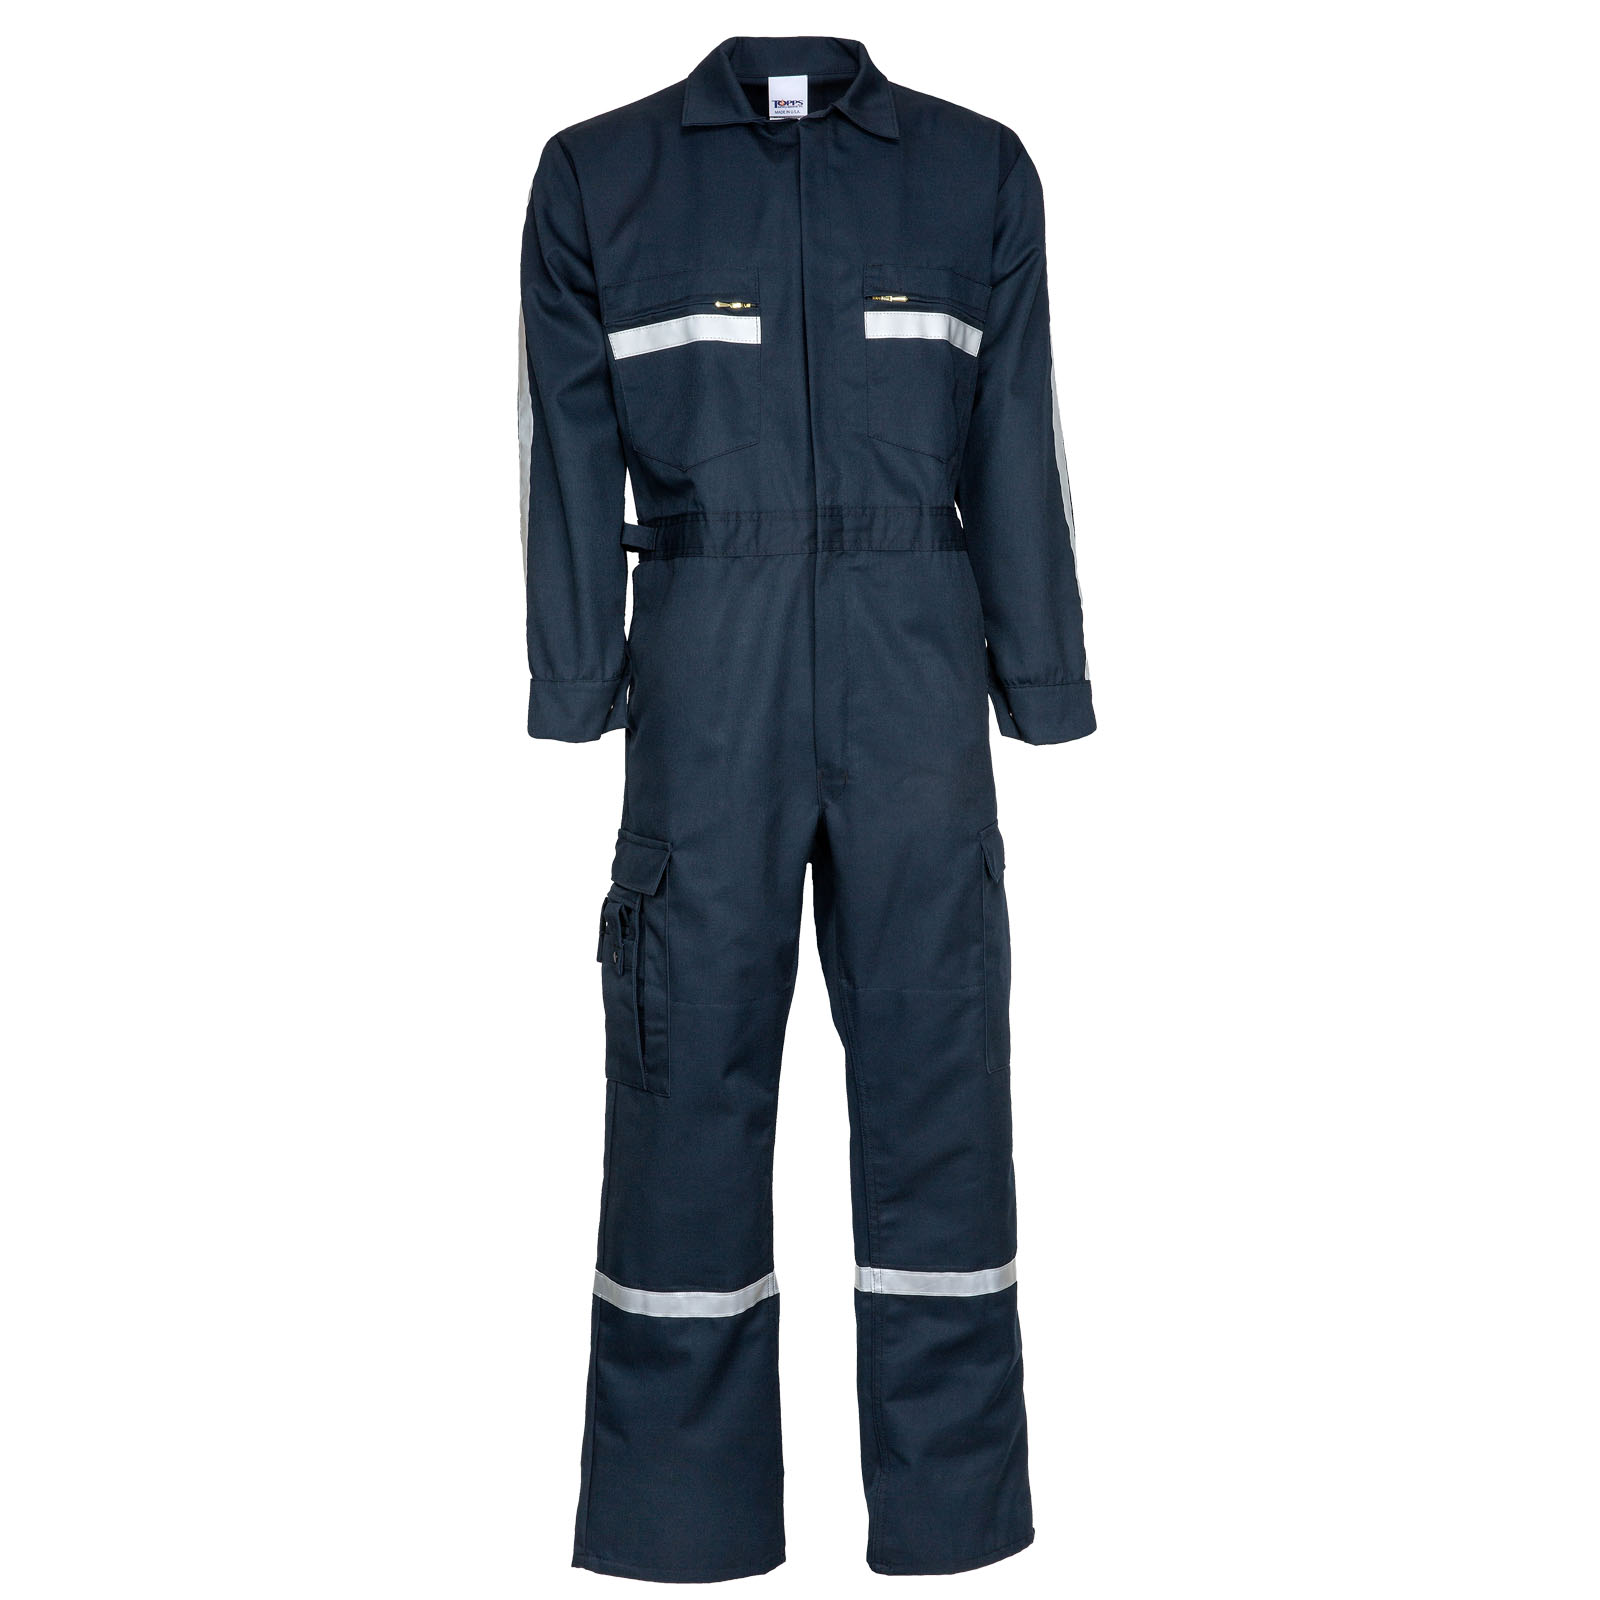 65/35 Long Sleeve Over-The-Clothes Fit Uniform Suit-